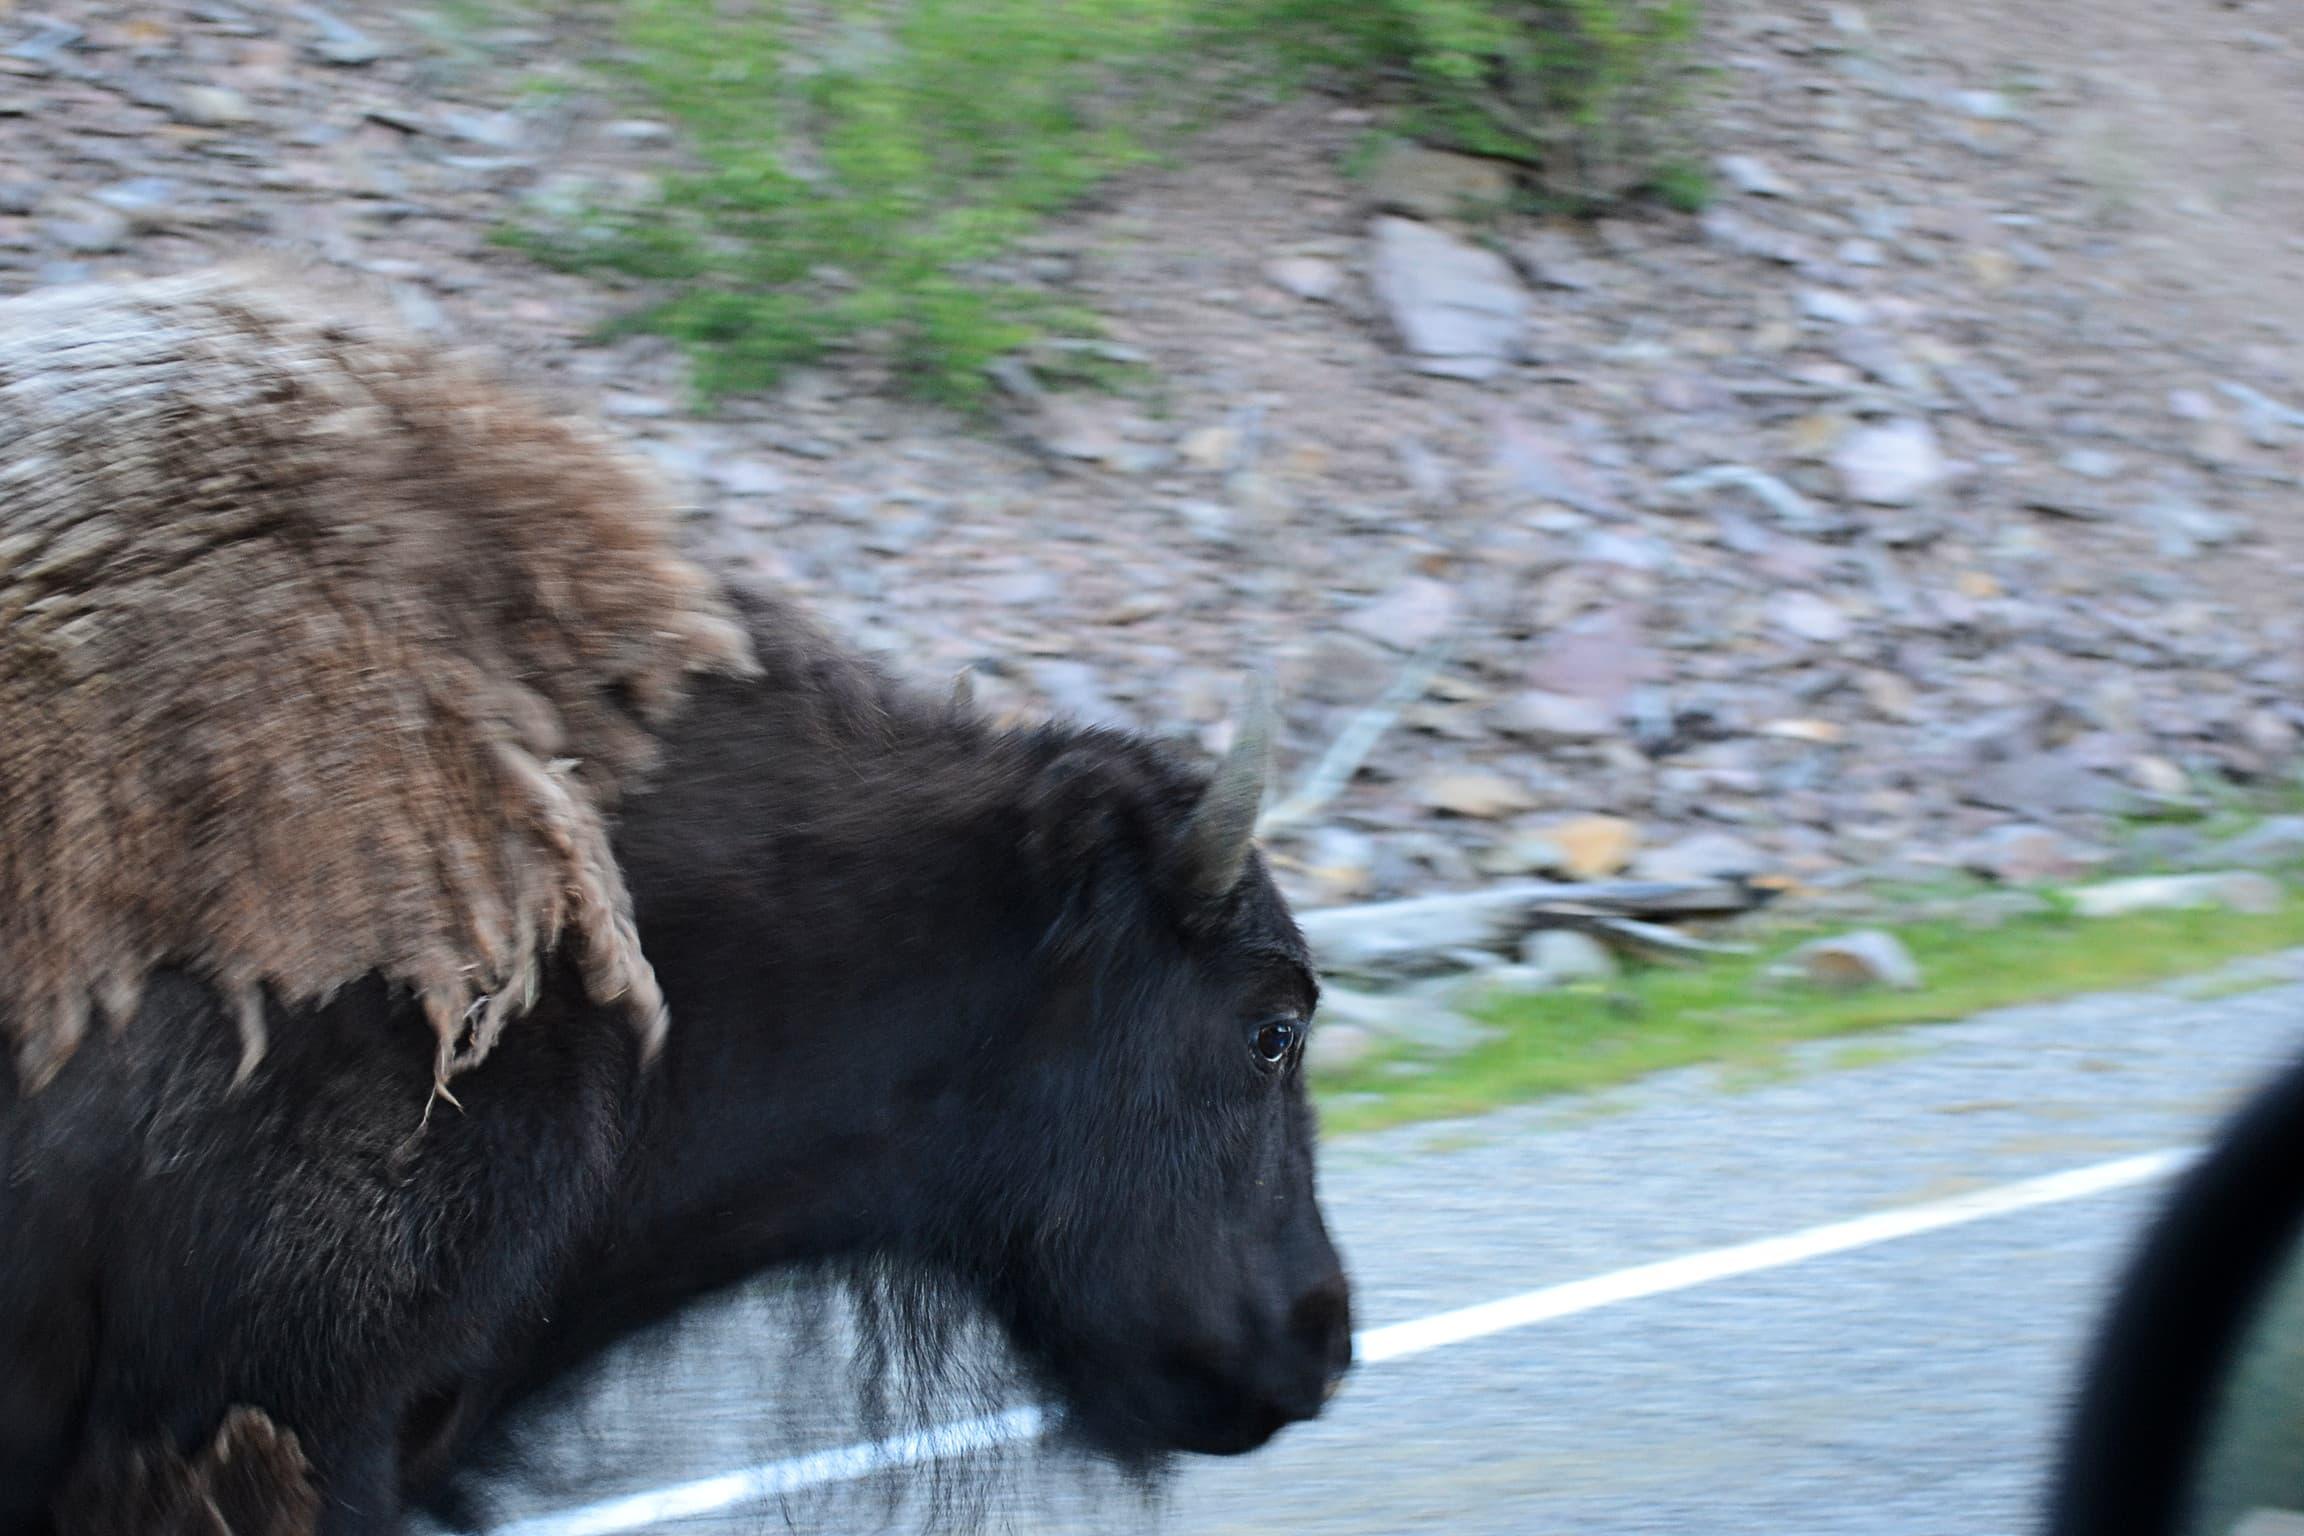 Eye to eye with a passing buffalo.